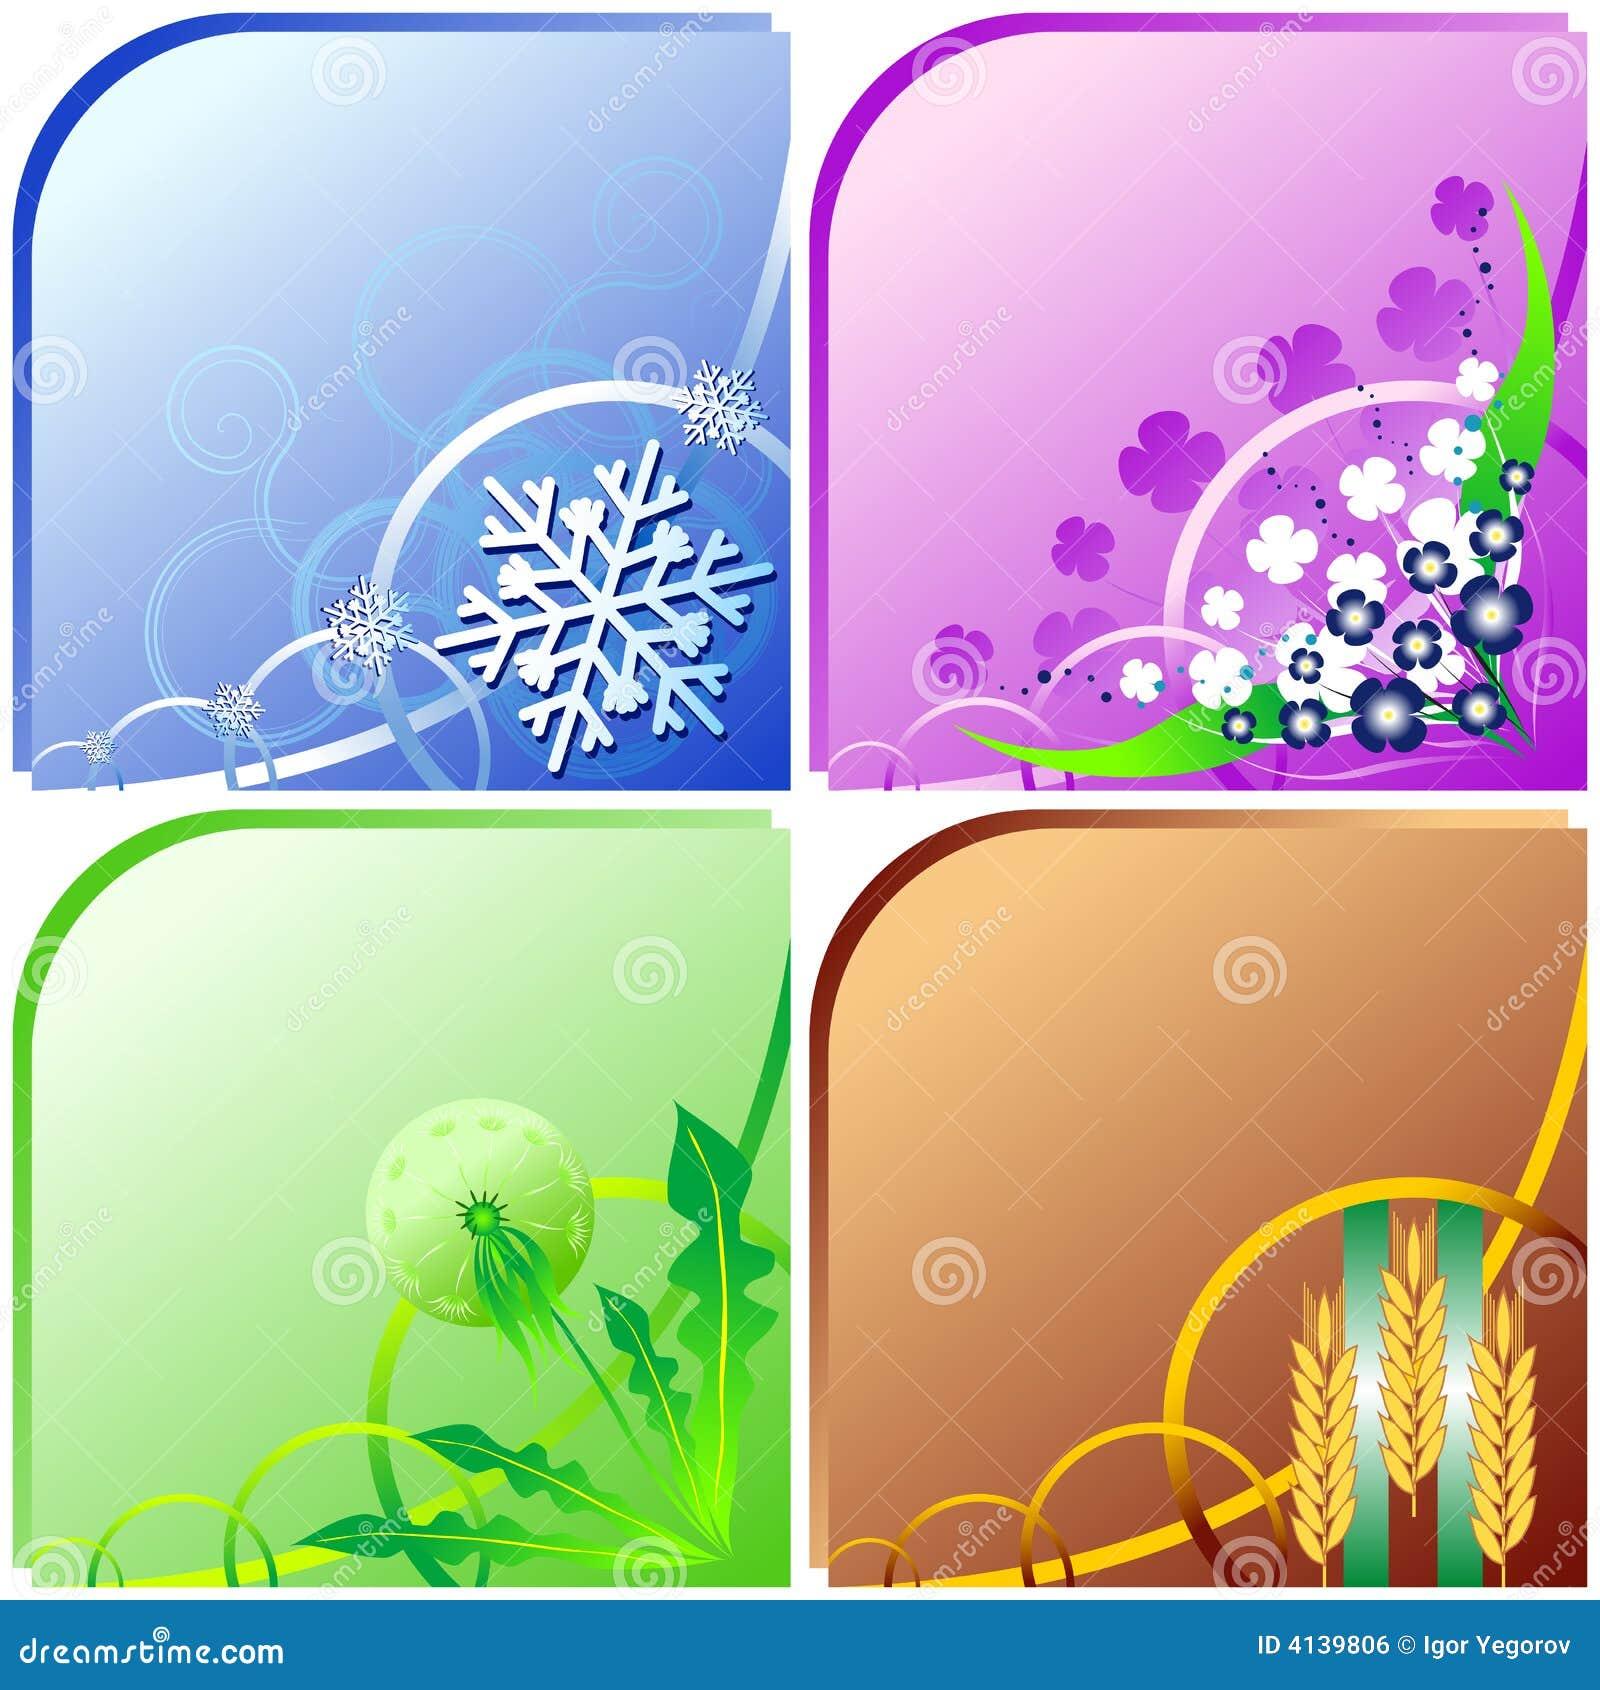 Four Seasons - Winter, Spring, Summer, Fall Stock Vector